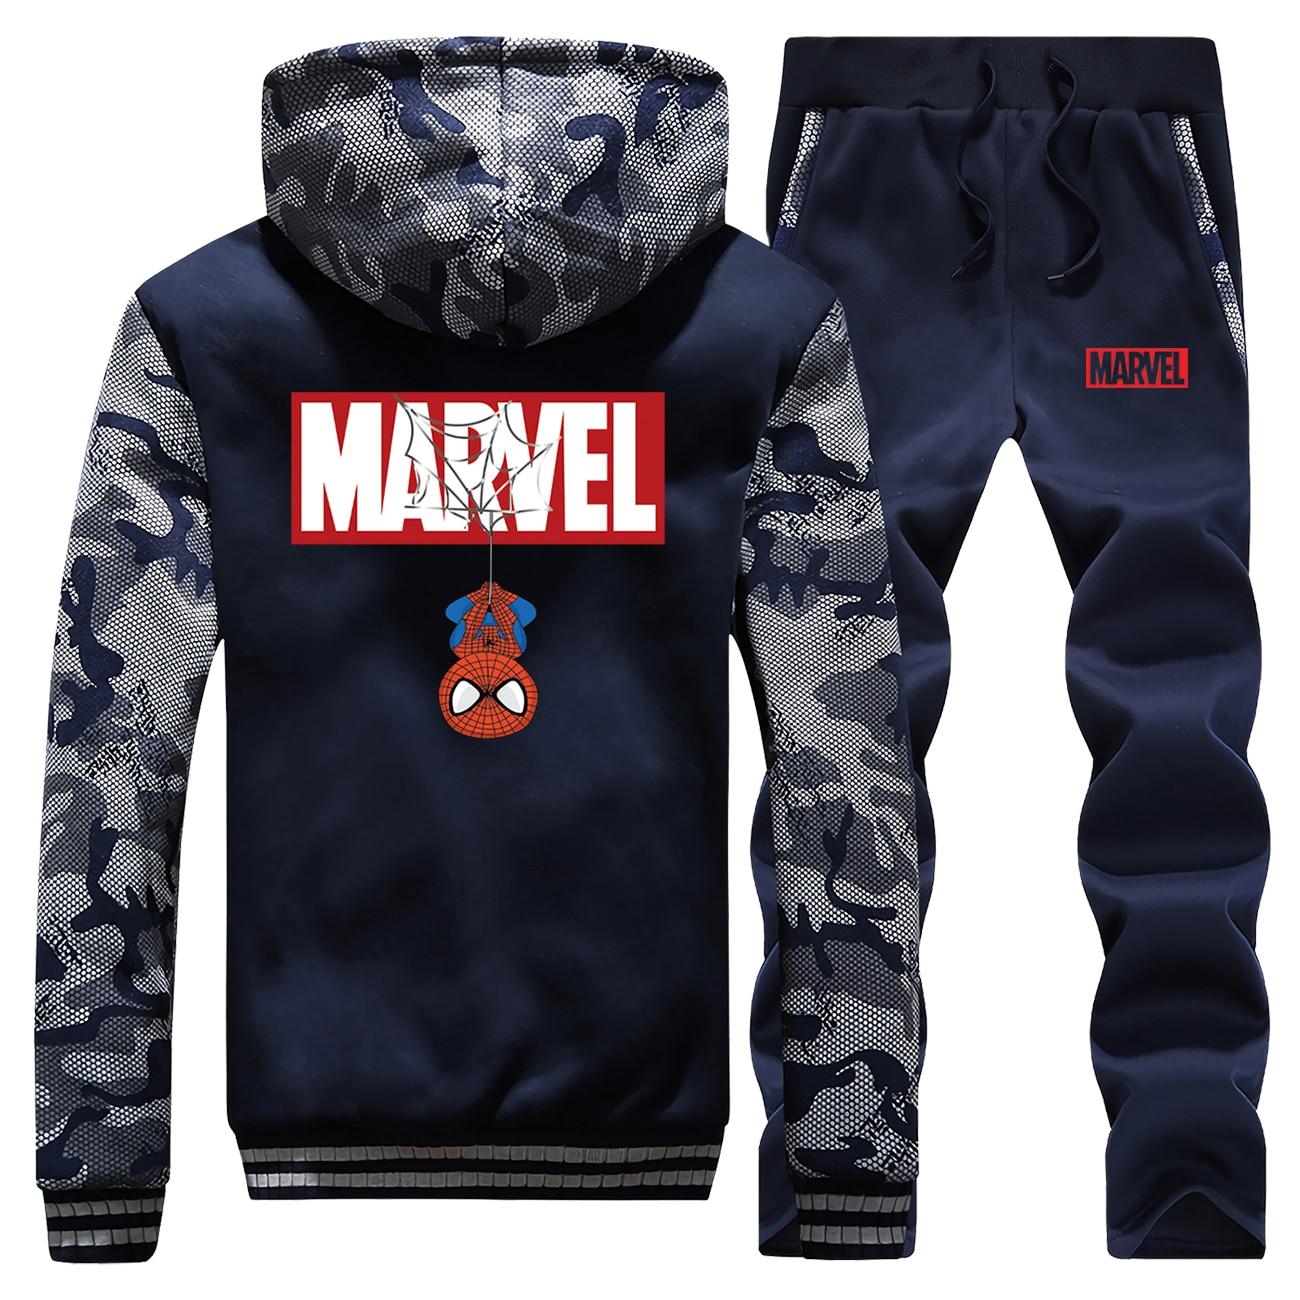 Spider-Man Superhero Camo Two Piece Set 2019 Fashion Winter Marvel Camoflage Jacket Fashion Fleece Casual Complete Man Tracksuit